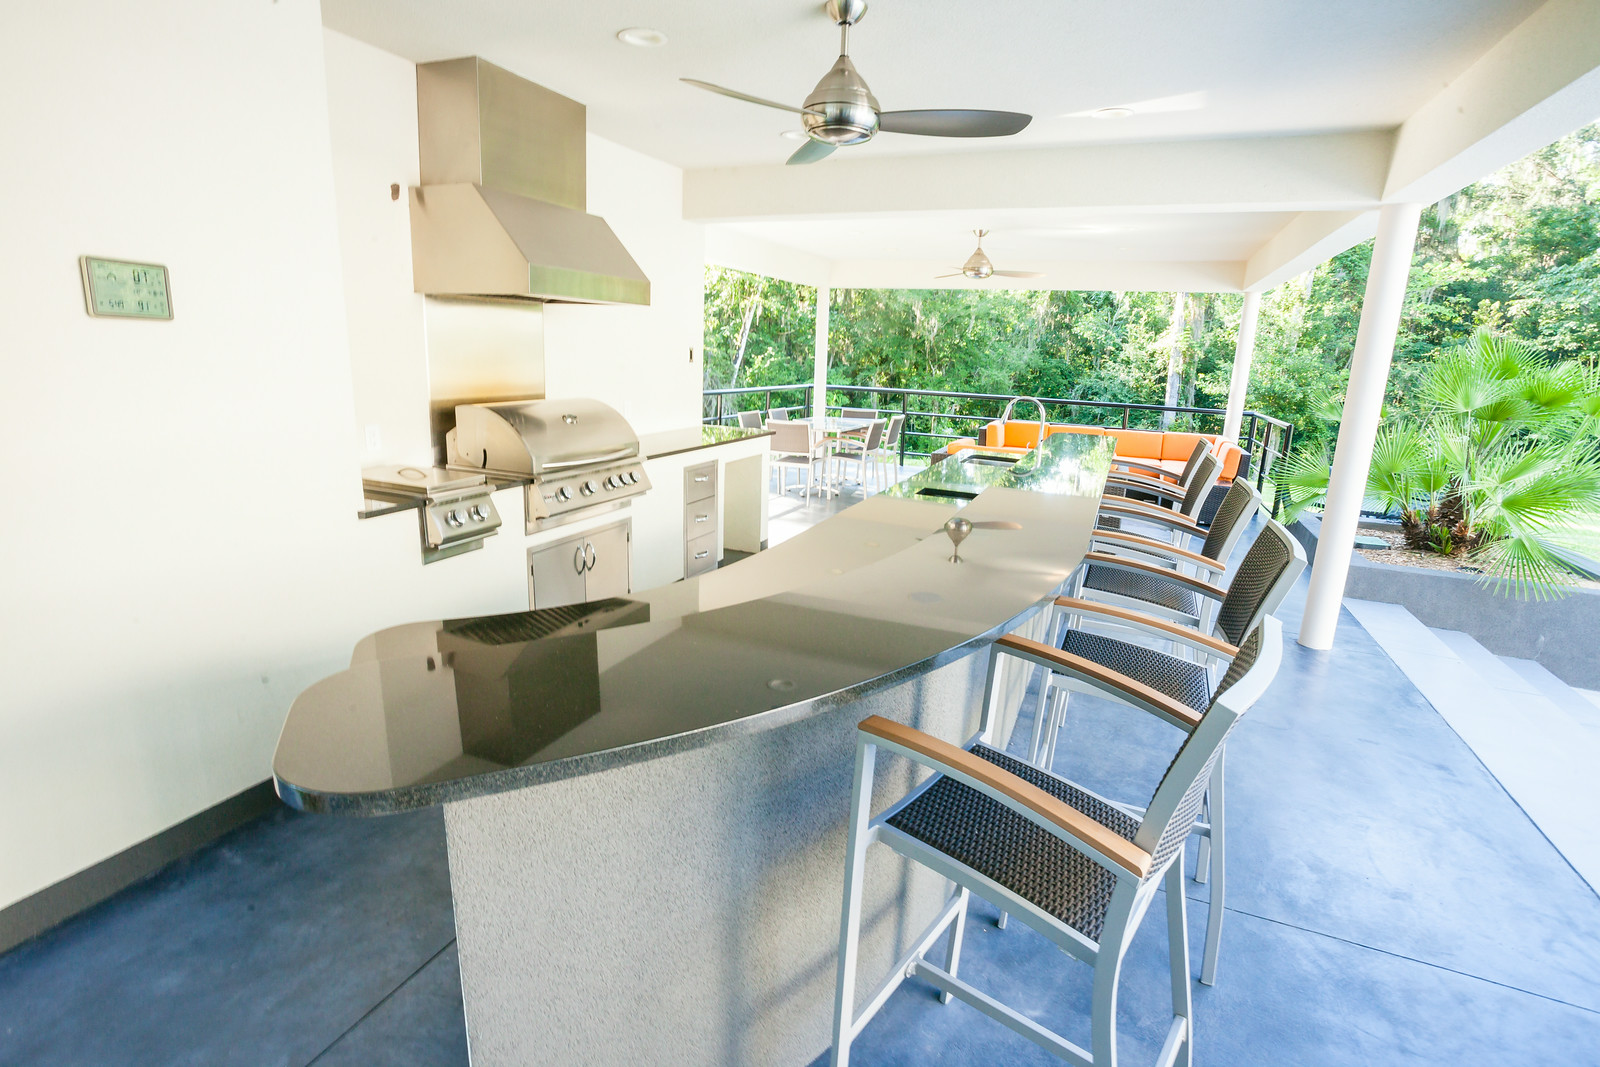 Outdoor Kitchen - Chandra Home